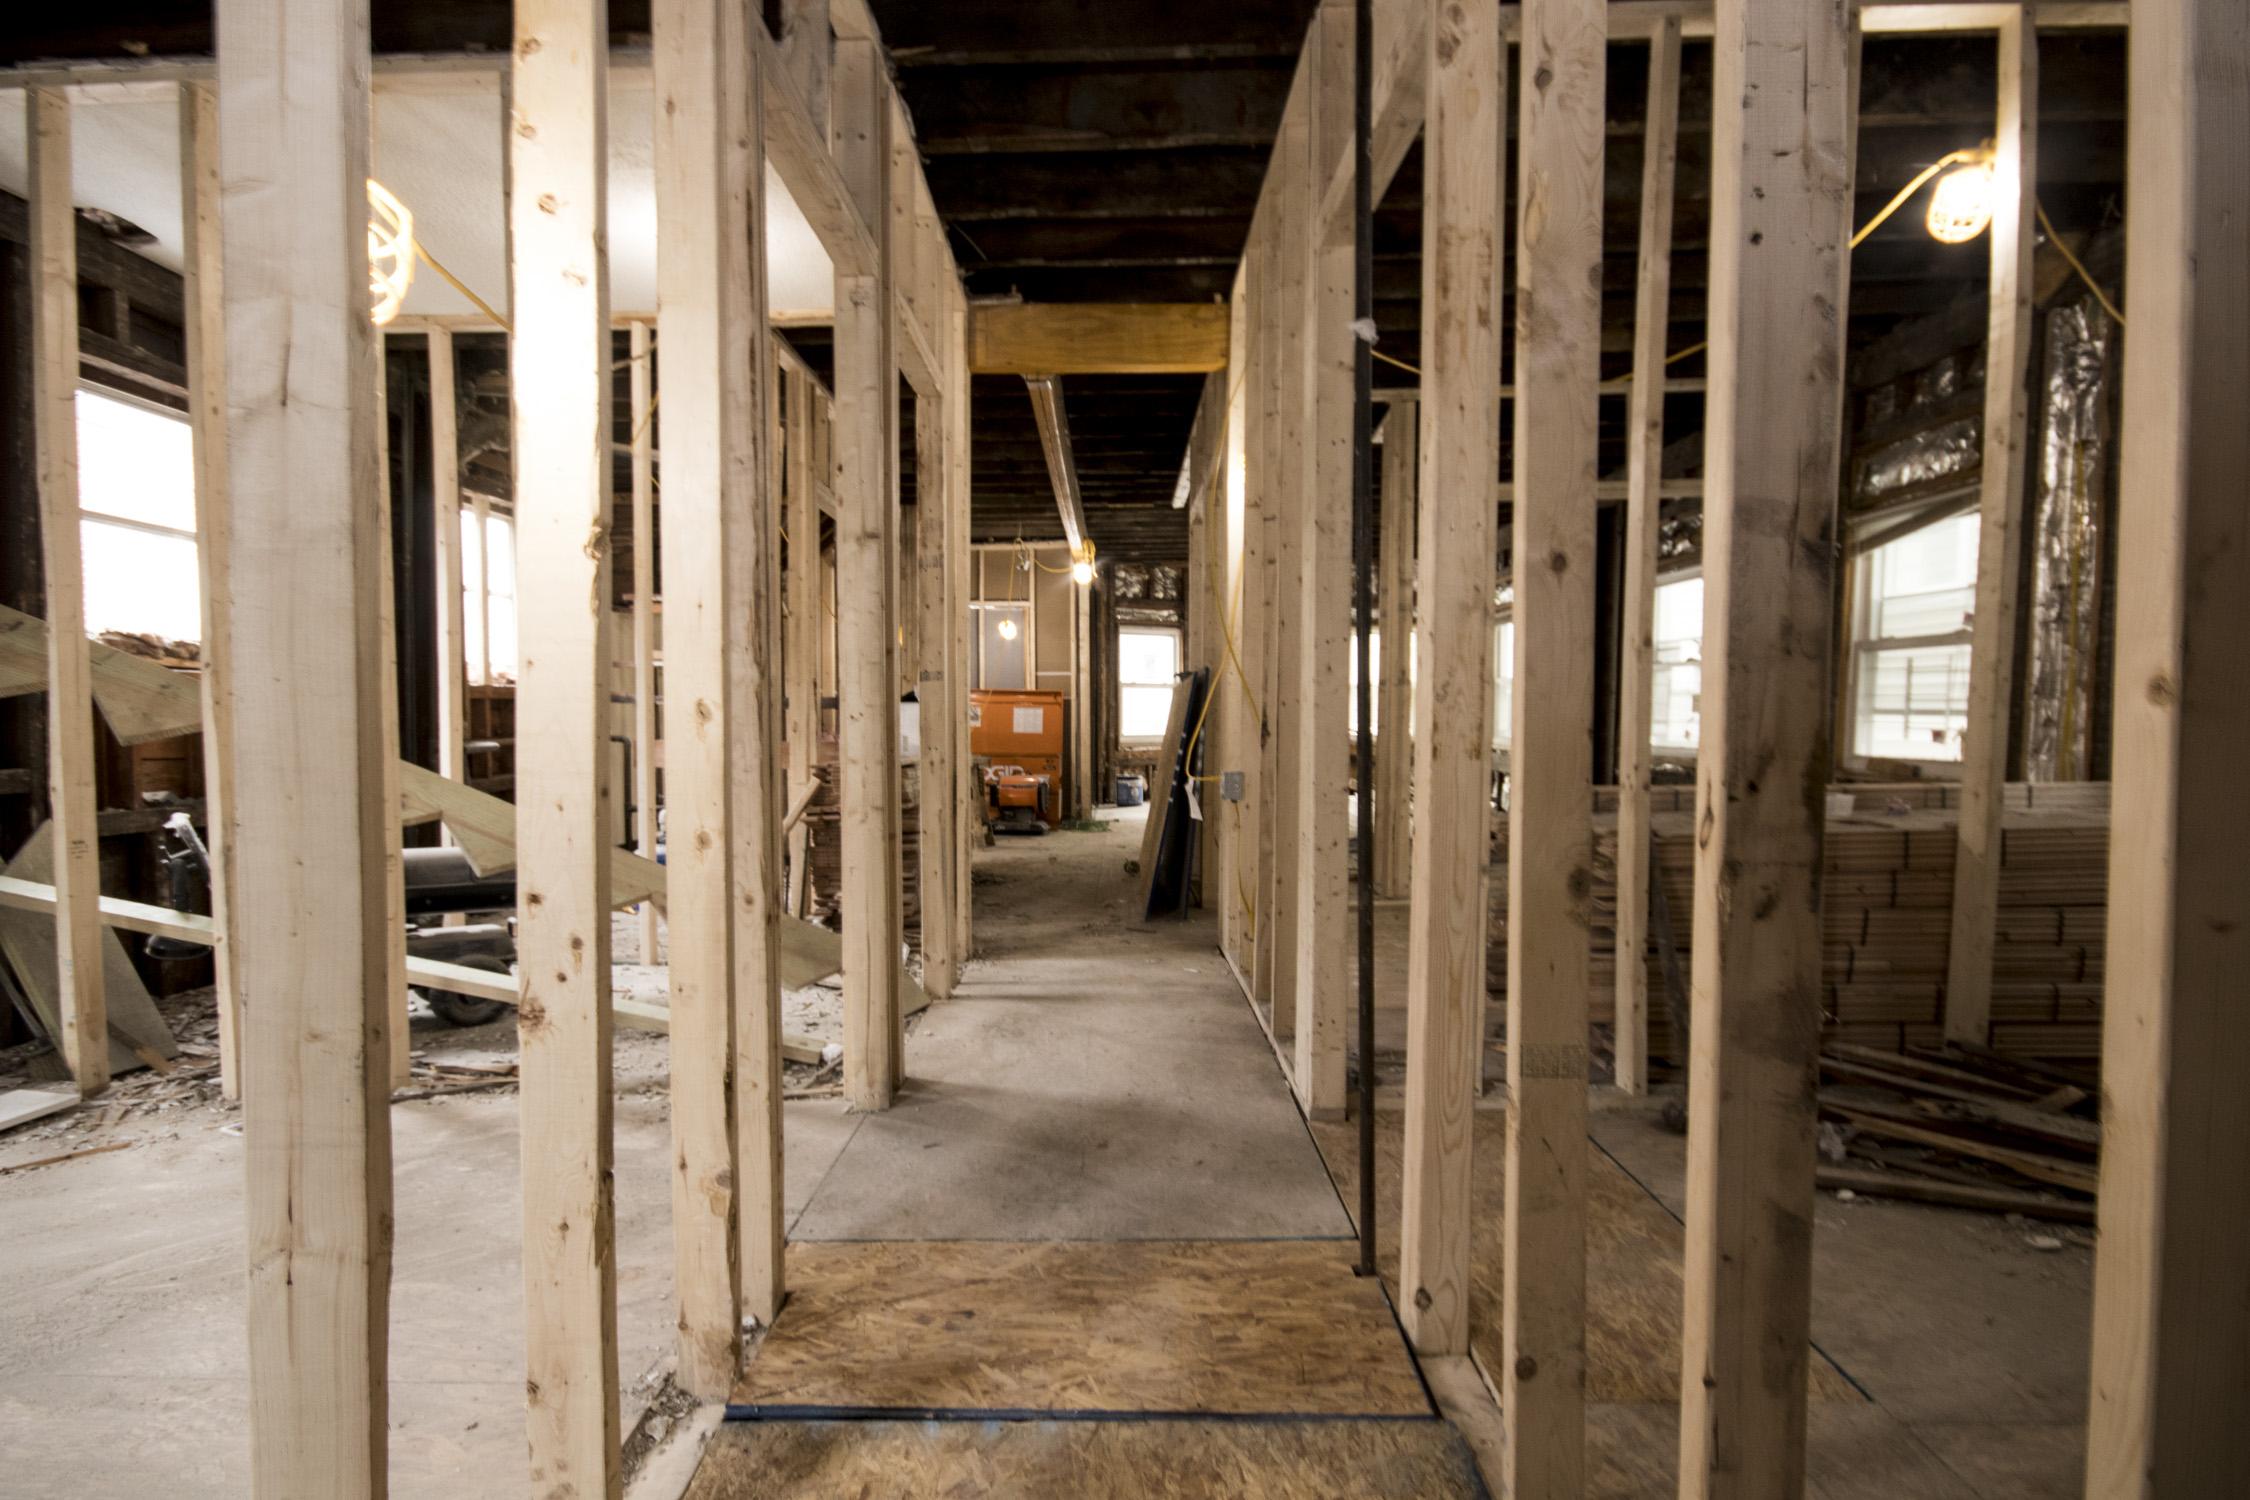 25 Darling St Boston General Contractors P Northeast Contractors_80